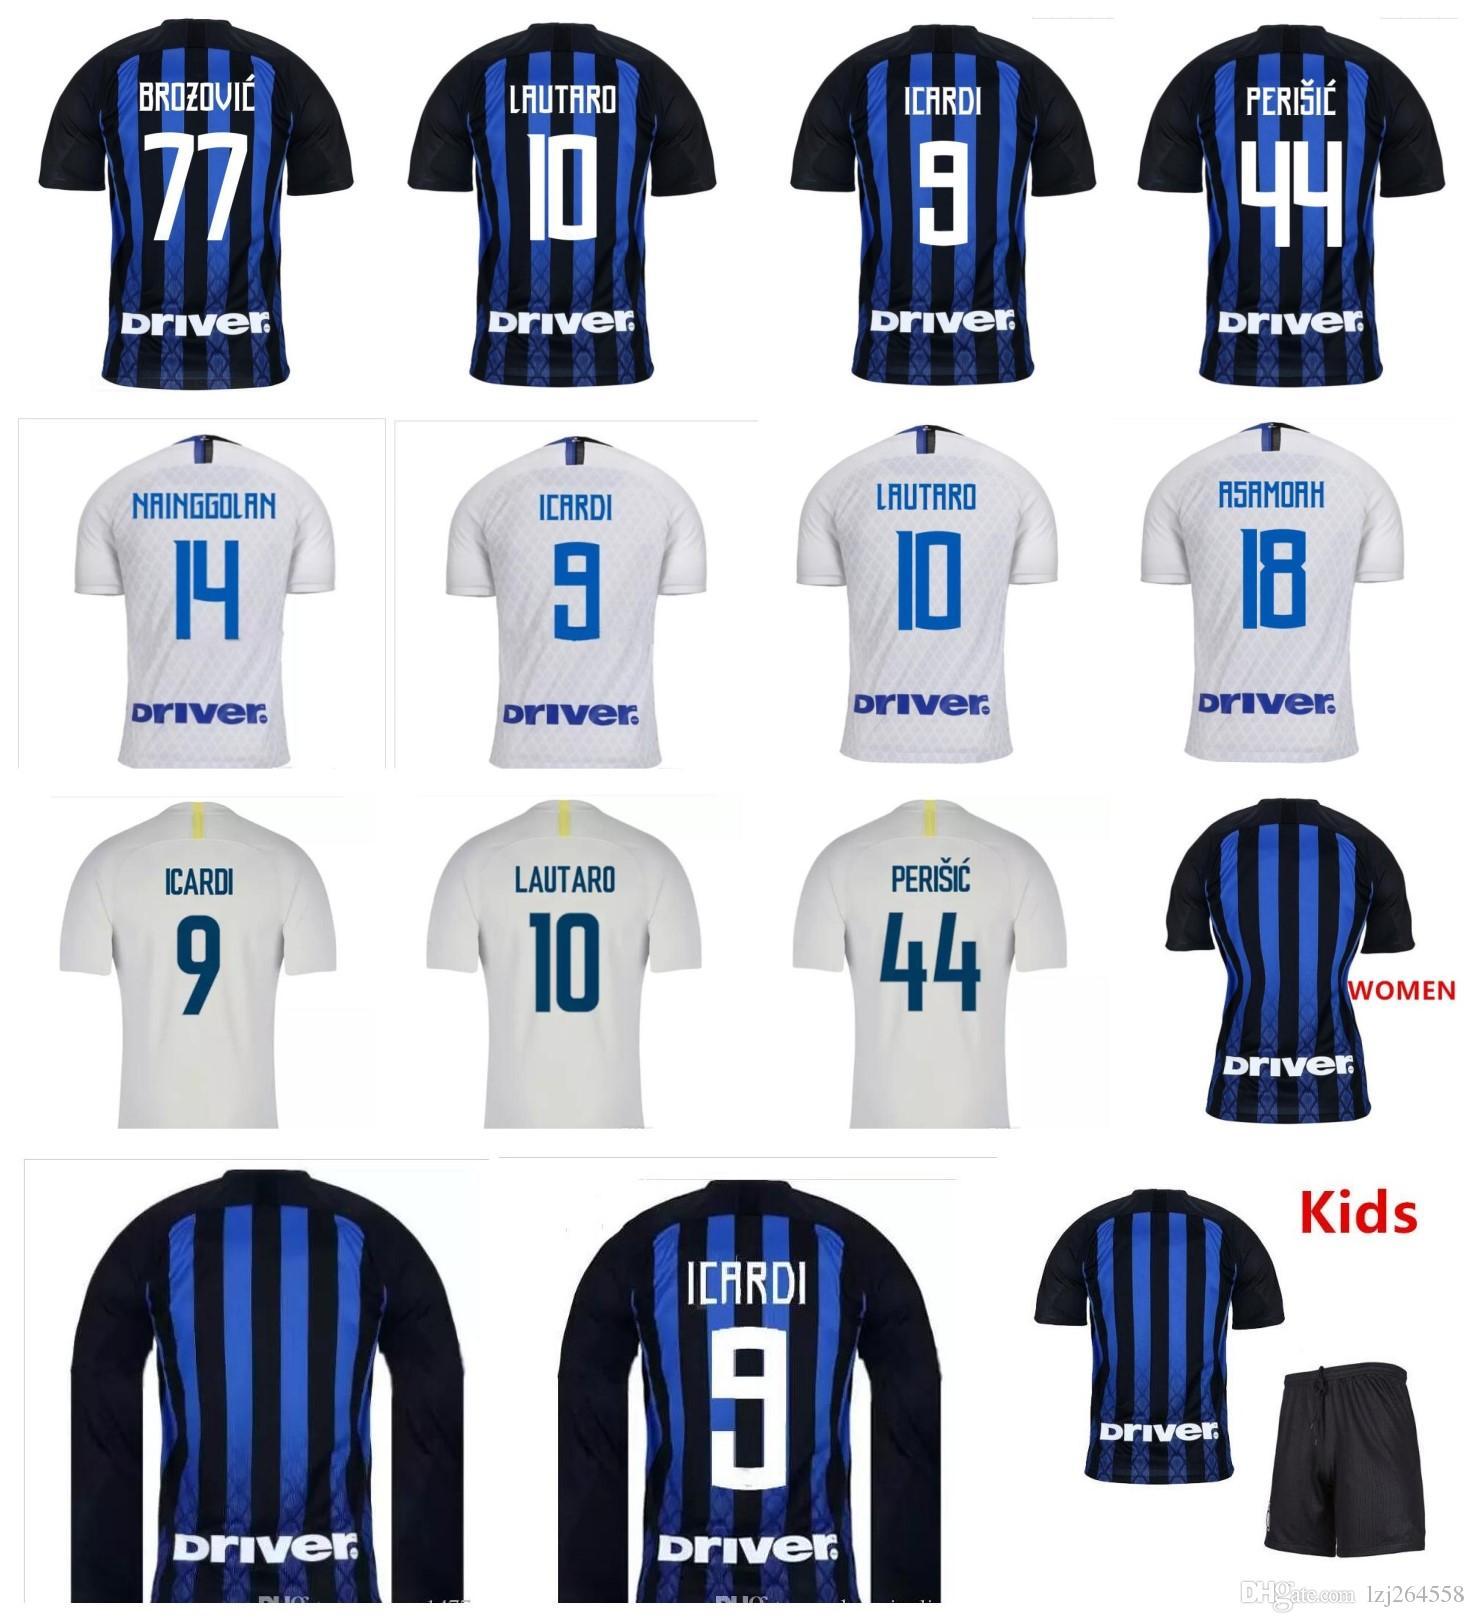 Novo Topo Thai 2019 Inter Jersey 18 19 Camisa de Futebol camisa de Futebol  MIU ICARDI Uniformes PERISIC Nainggolan Lauturo Skriniar 2018 Kits Para  Crianças fd16d7b5faeef